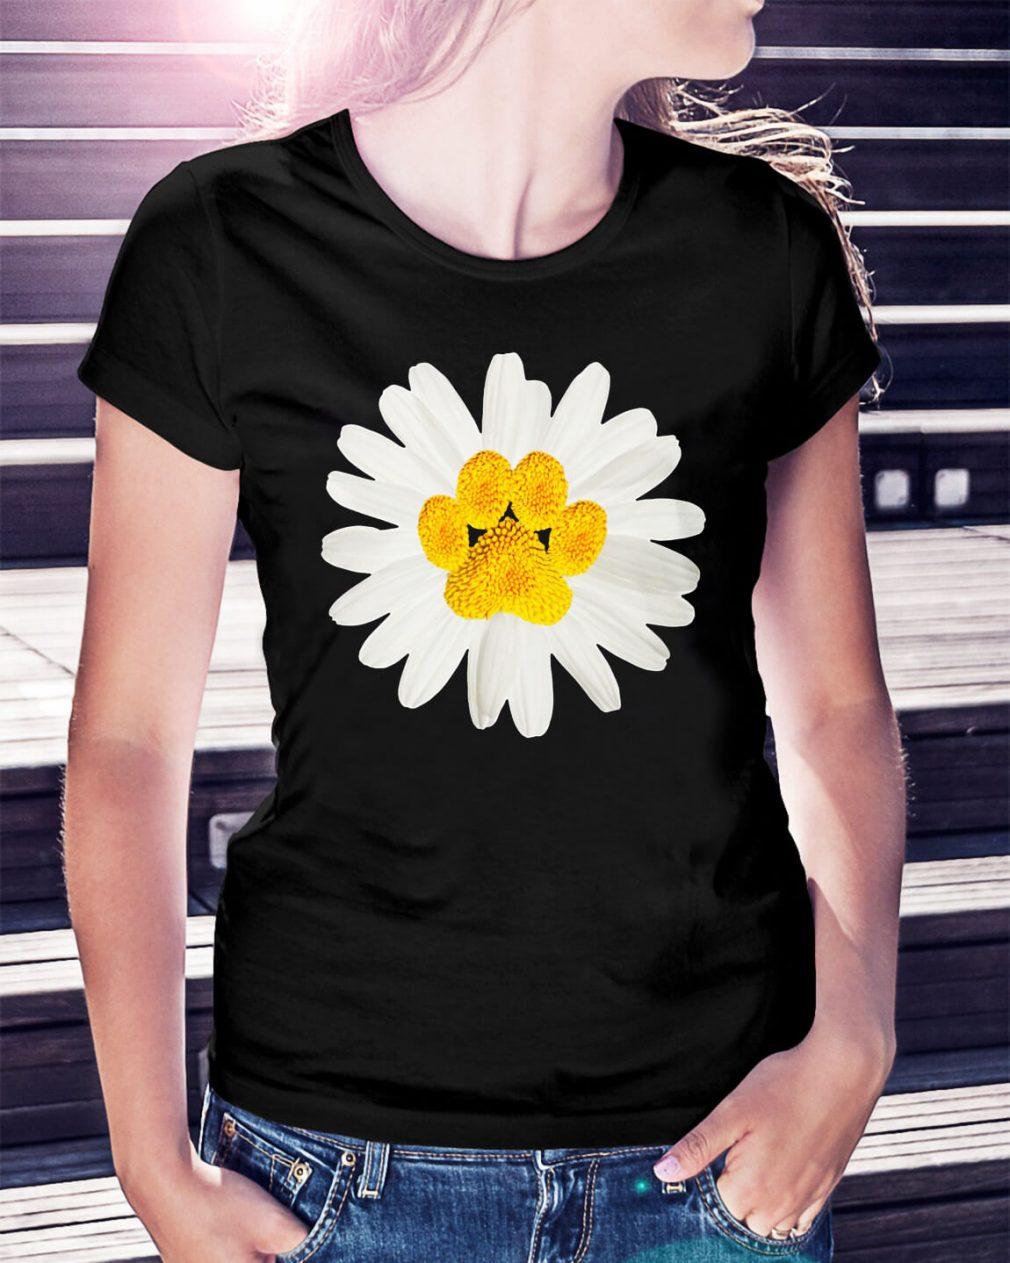 Dogpaw daisy shirt